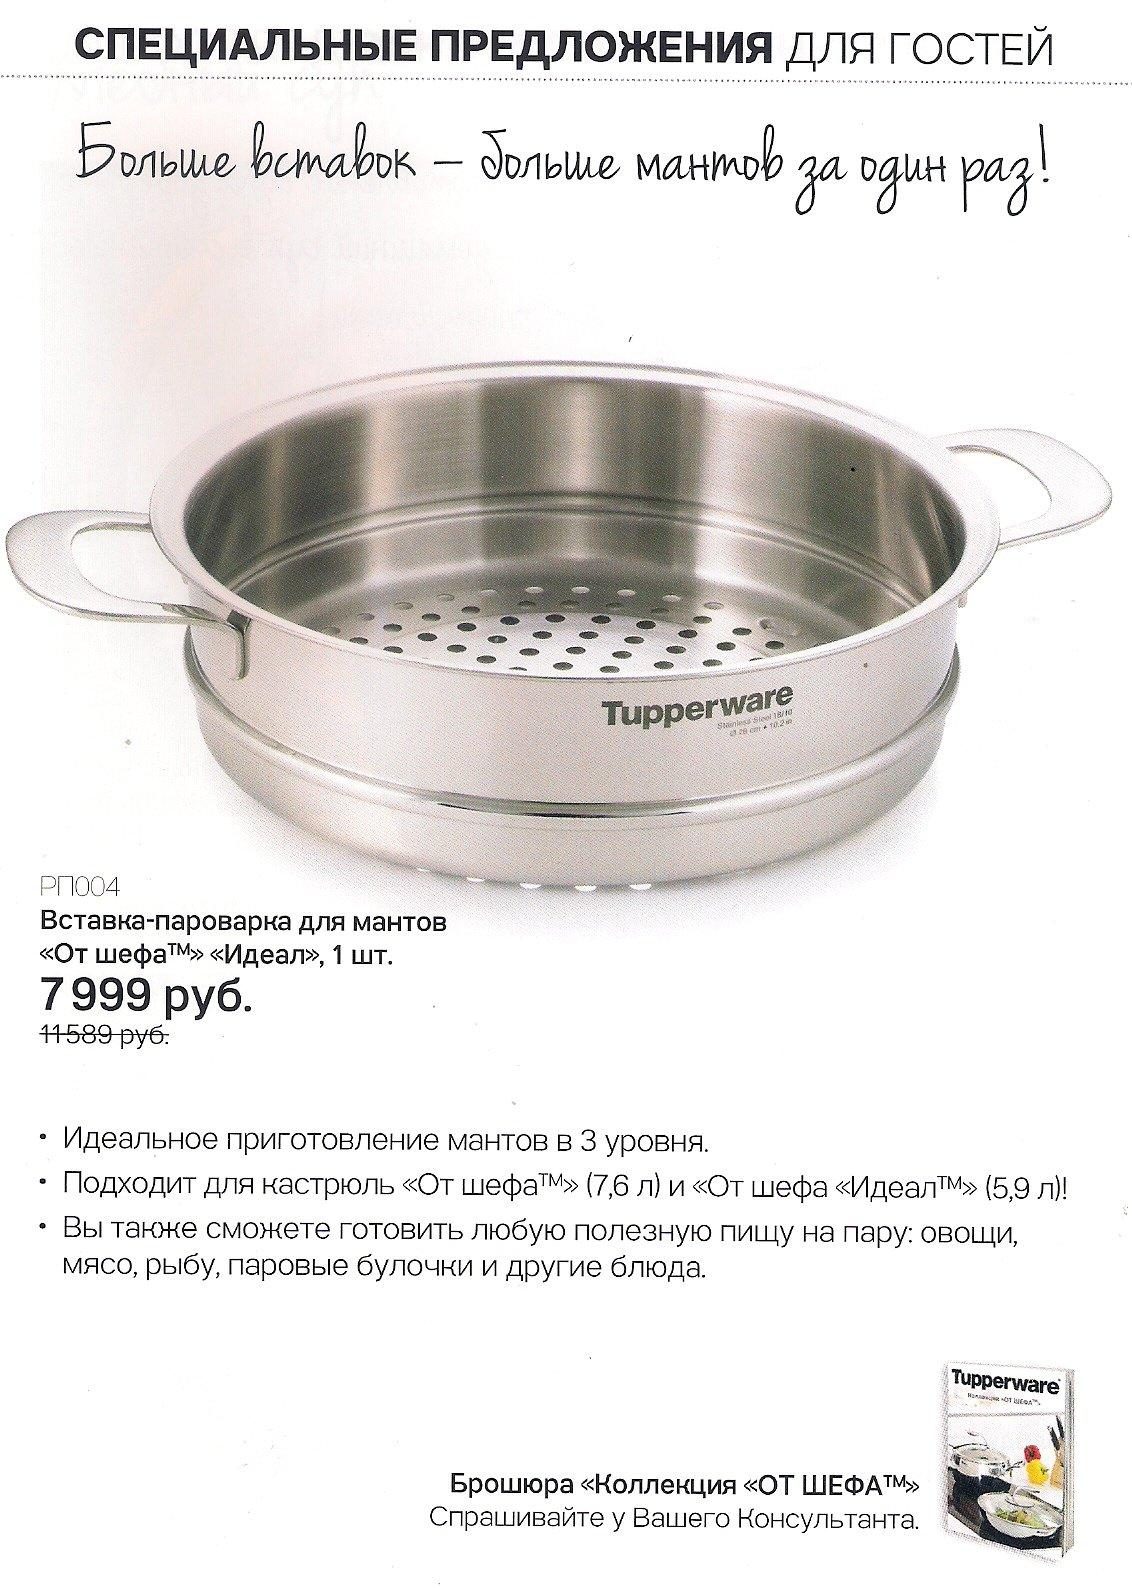 http://tupperware-online.ru/images/upload/14g.jpg